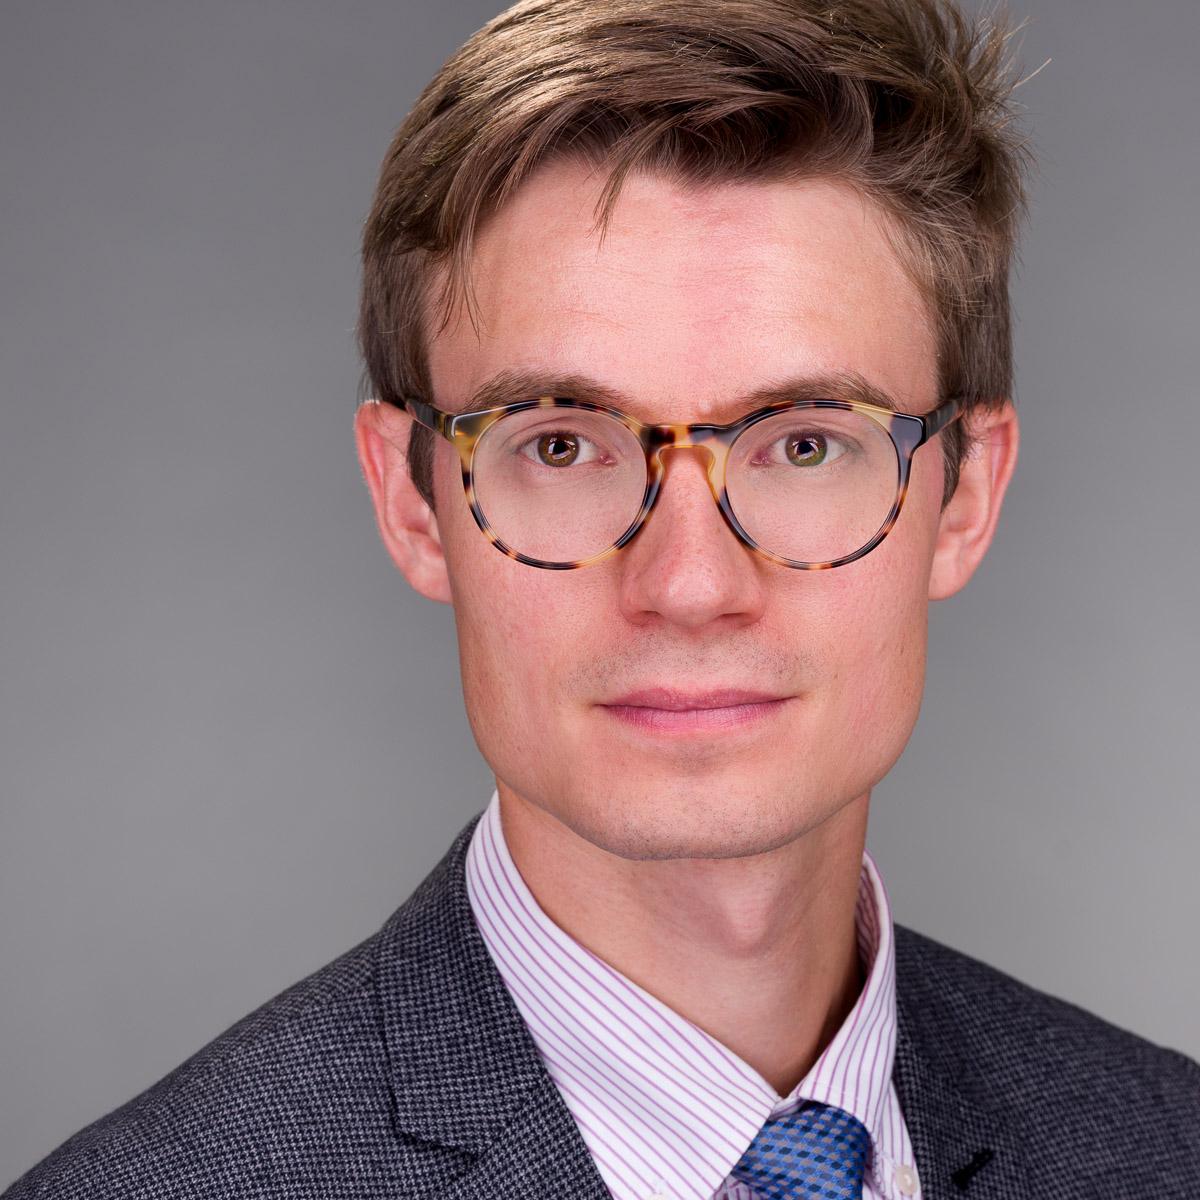 Christian Oleson